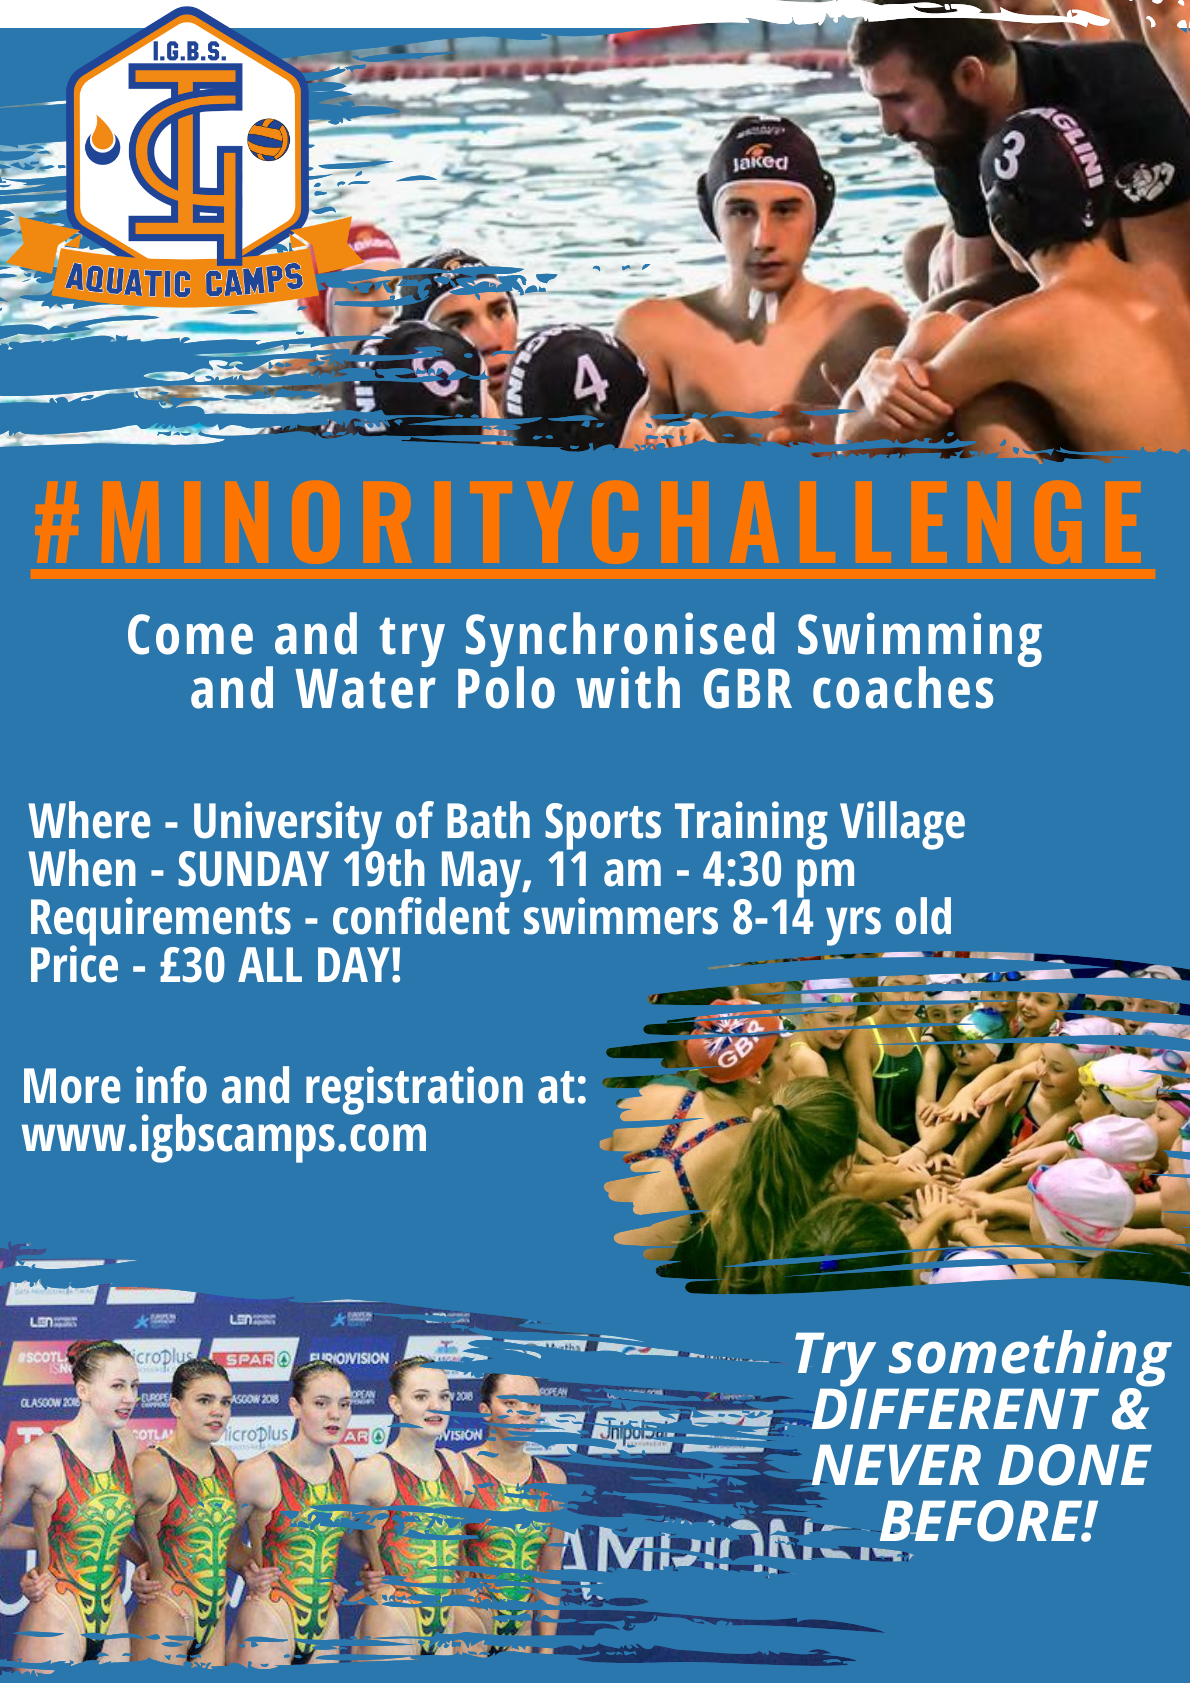 IGBS #Minority Challenge Half Term Camp